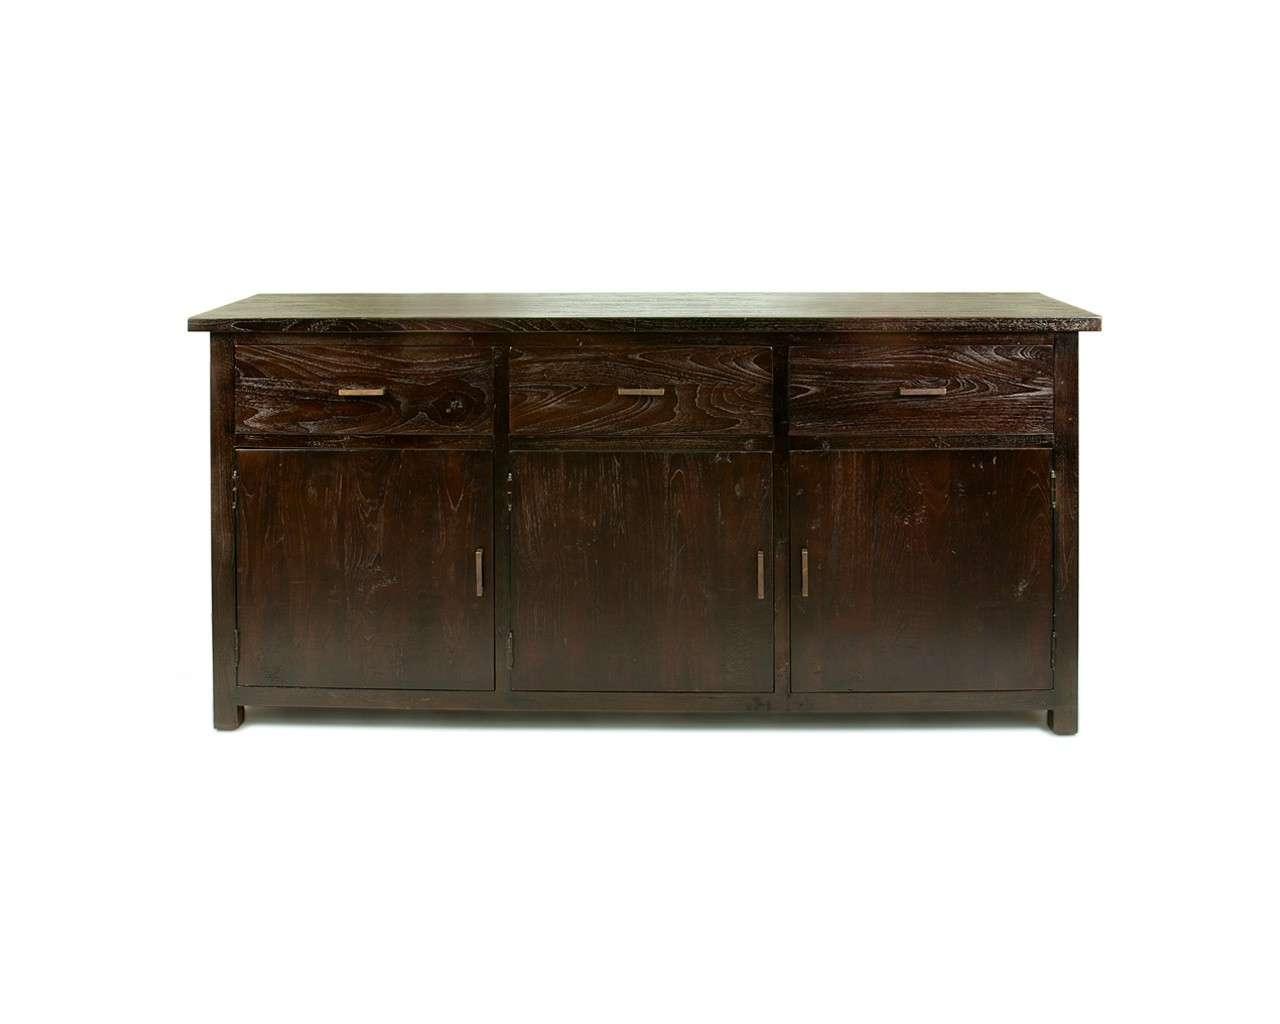 Large Dark Teak Sideboard – Reclaimed Wood Contemporary Furniture With Dark Brown Sideboards (View 8 of 20)